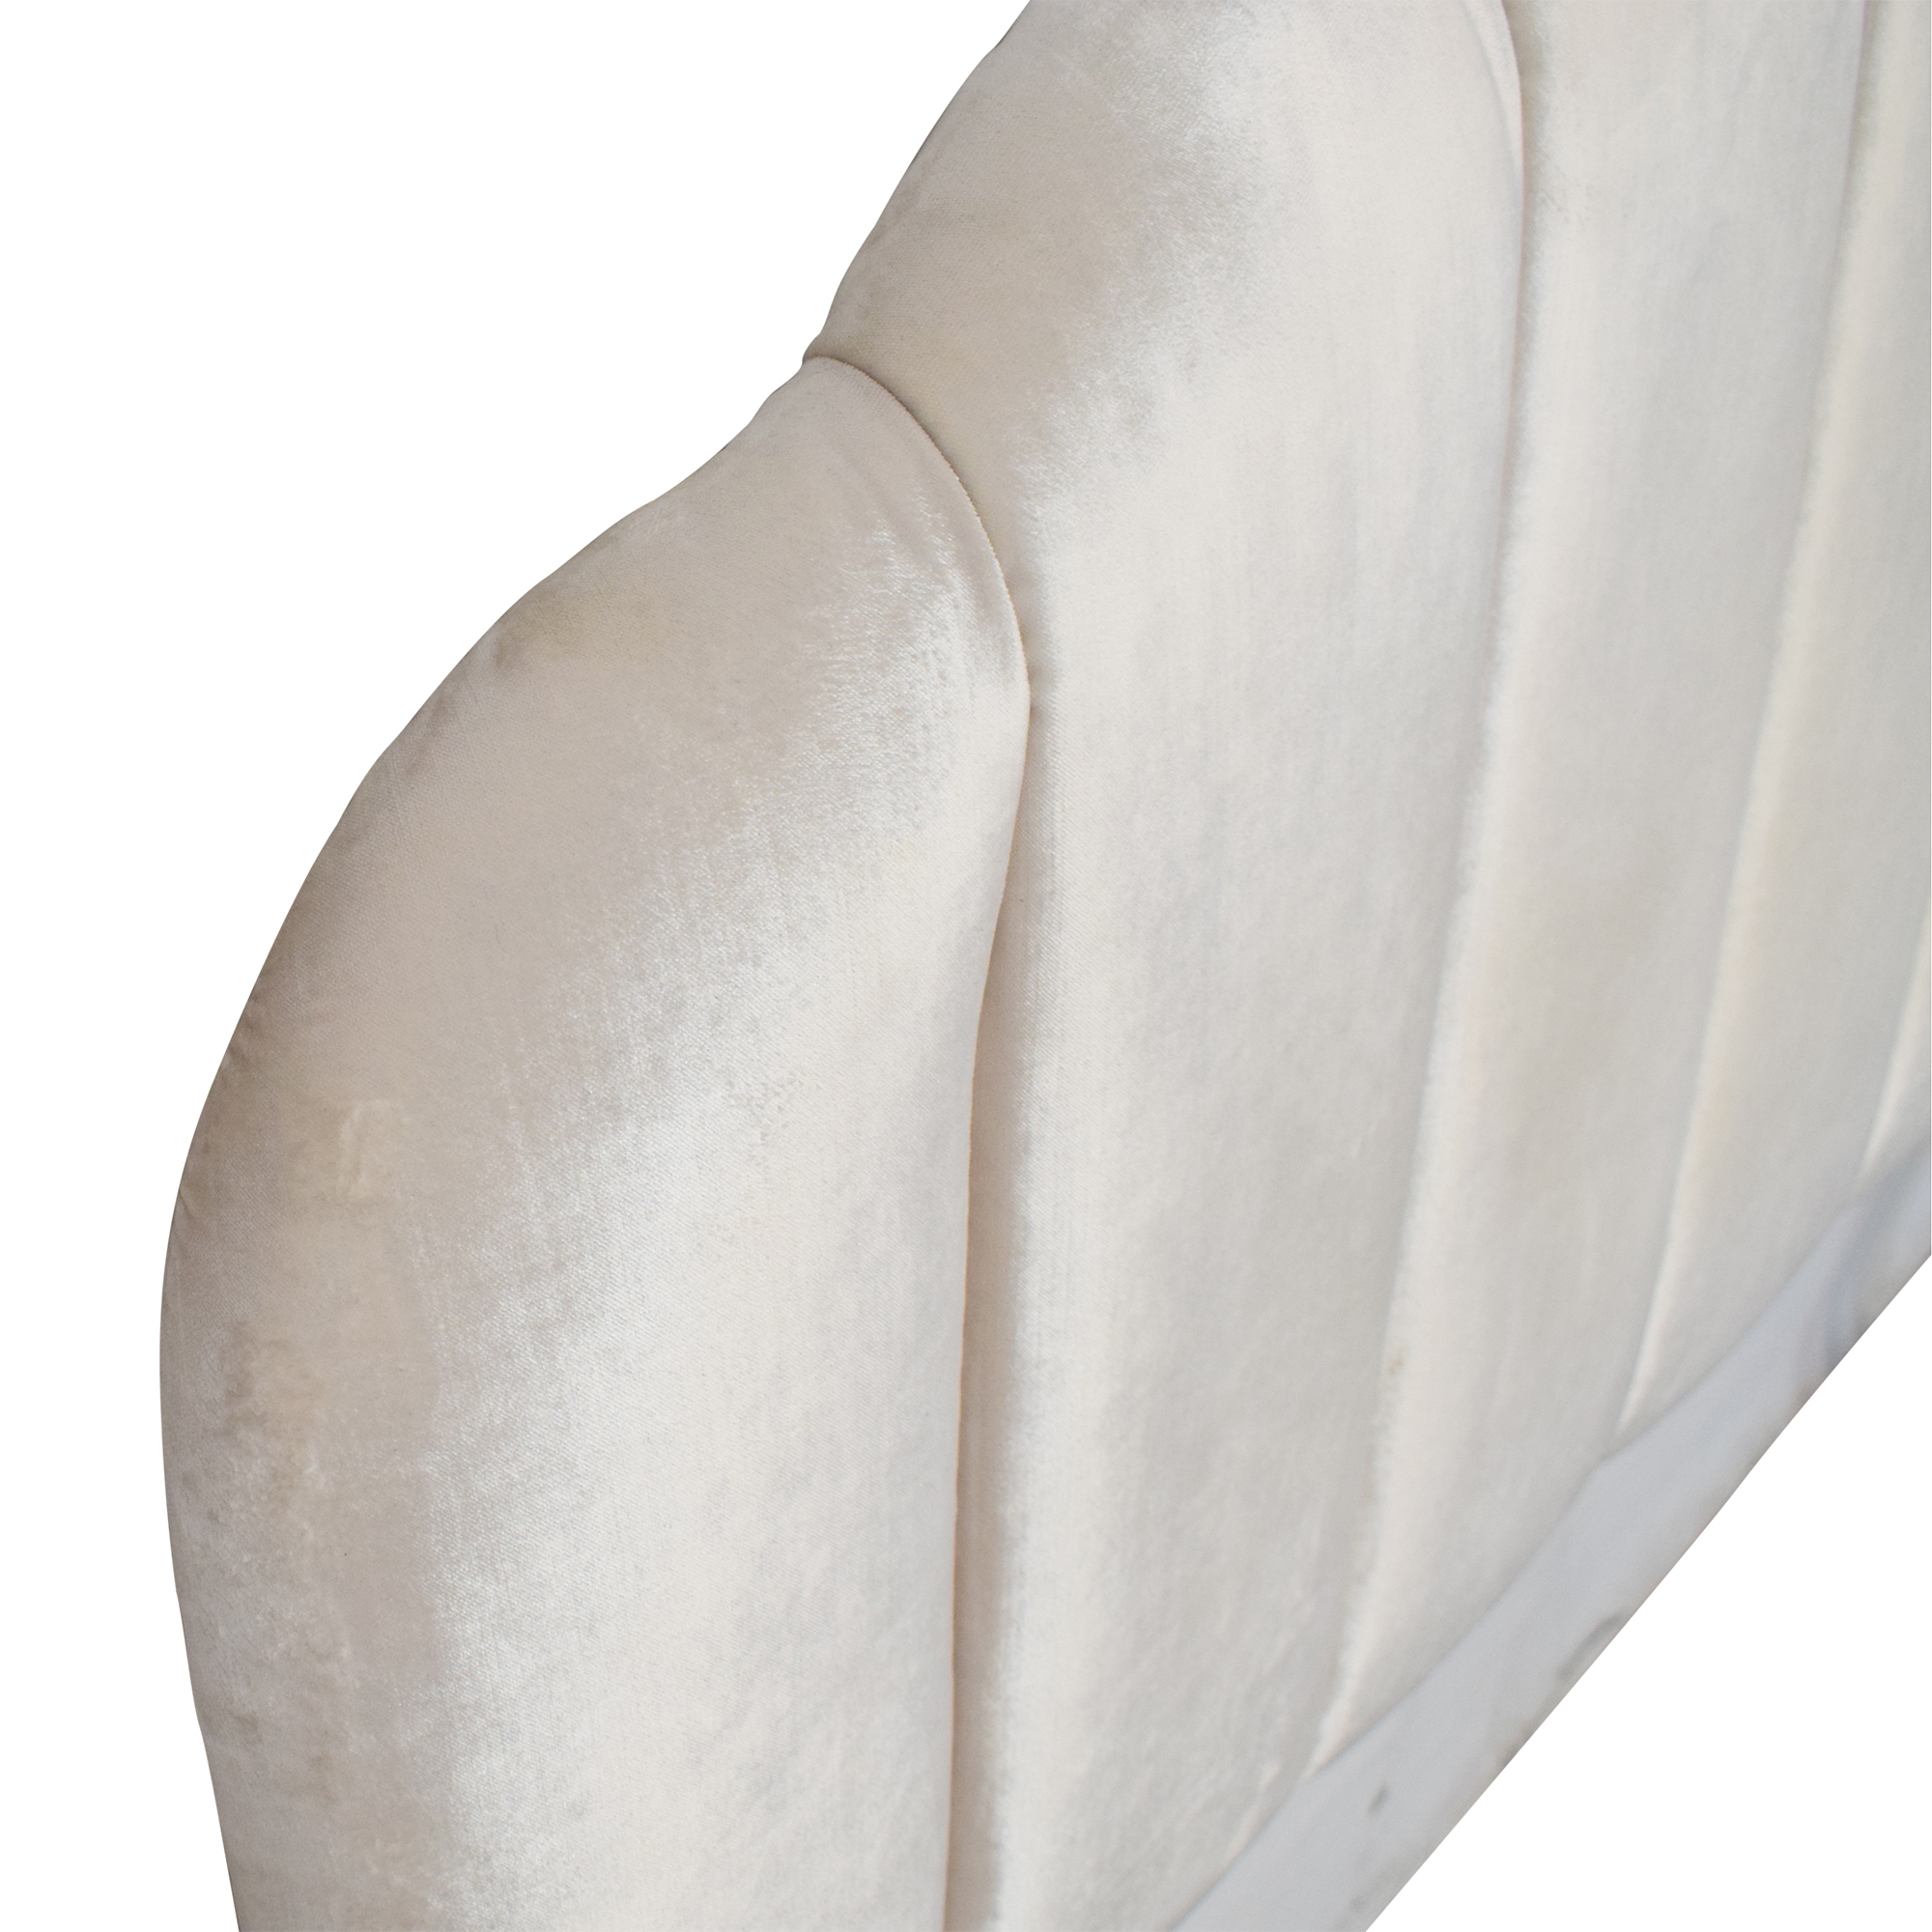 buy World Market Channel Back Deco Upholstered Queen Headboard World Market